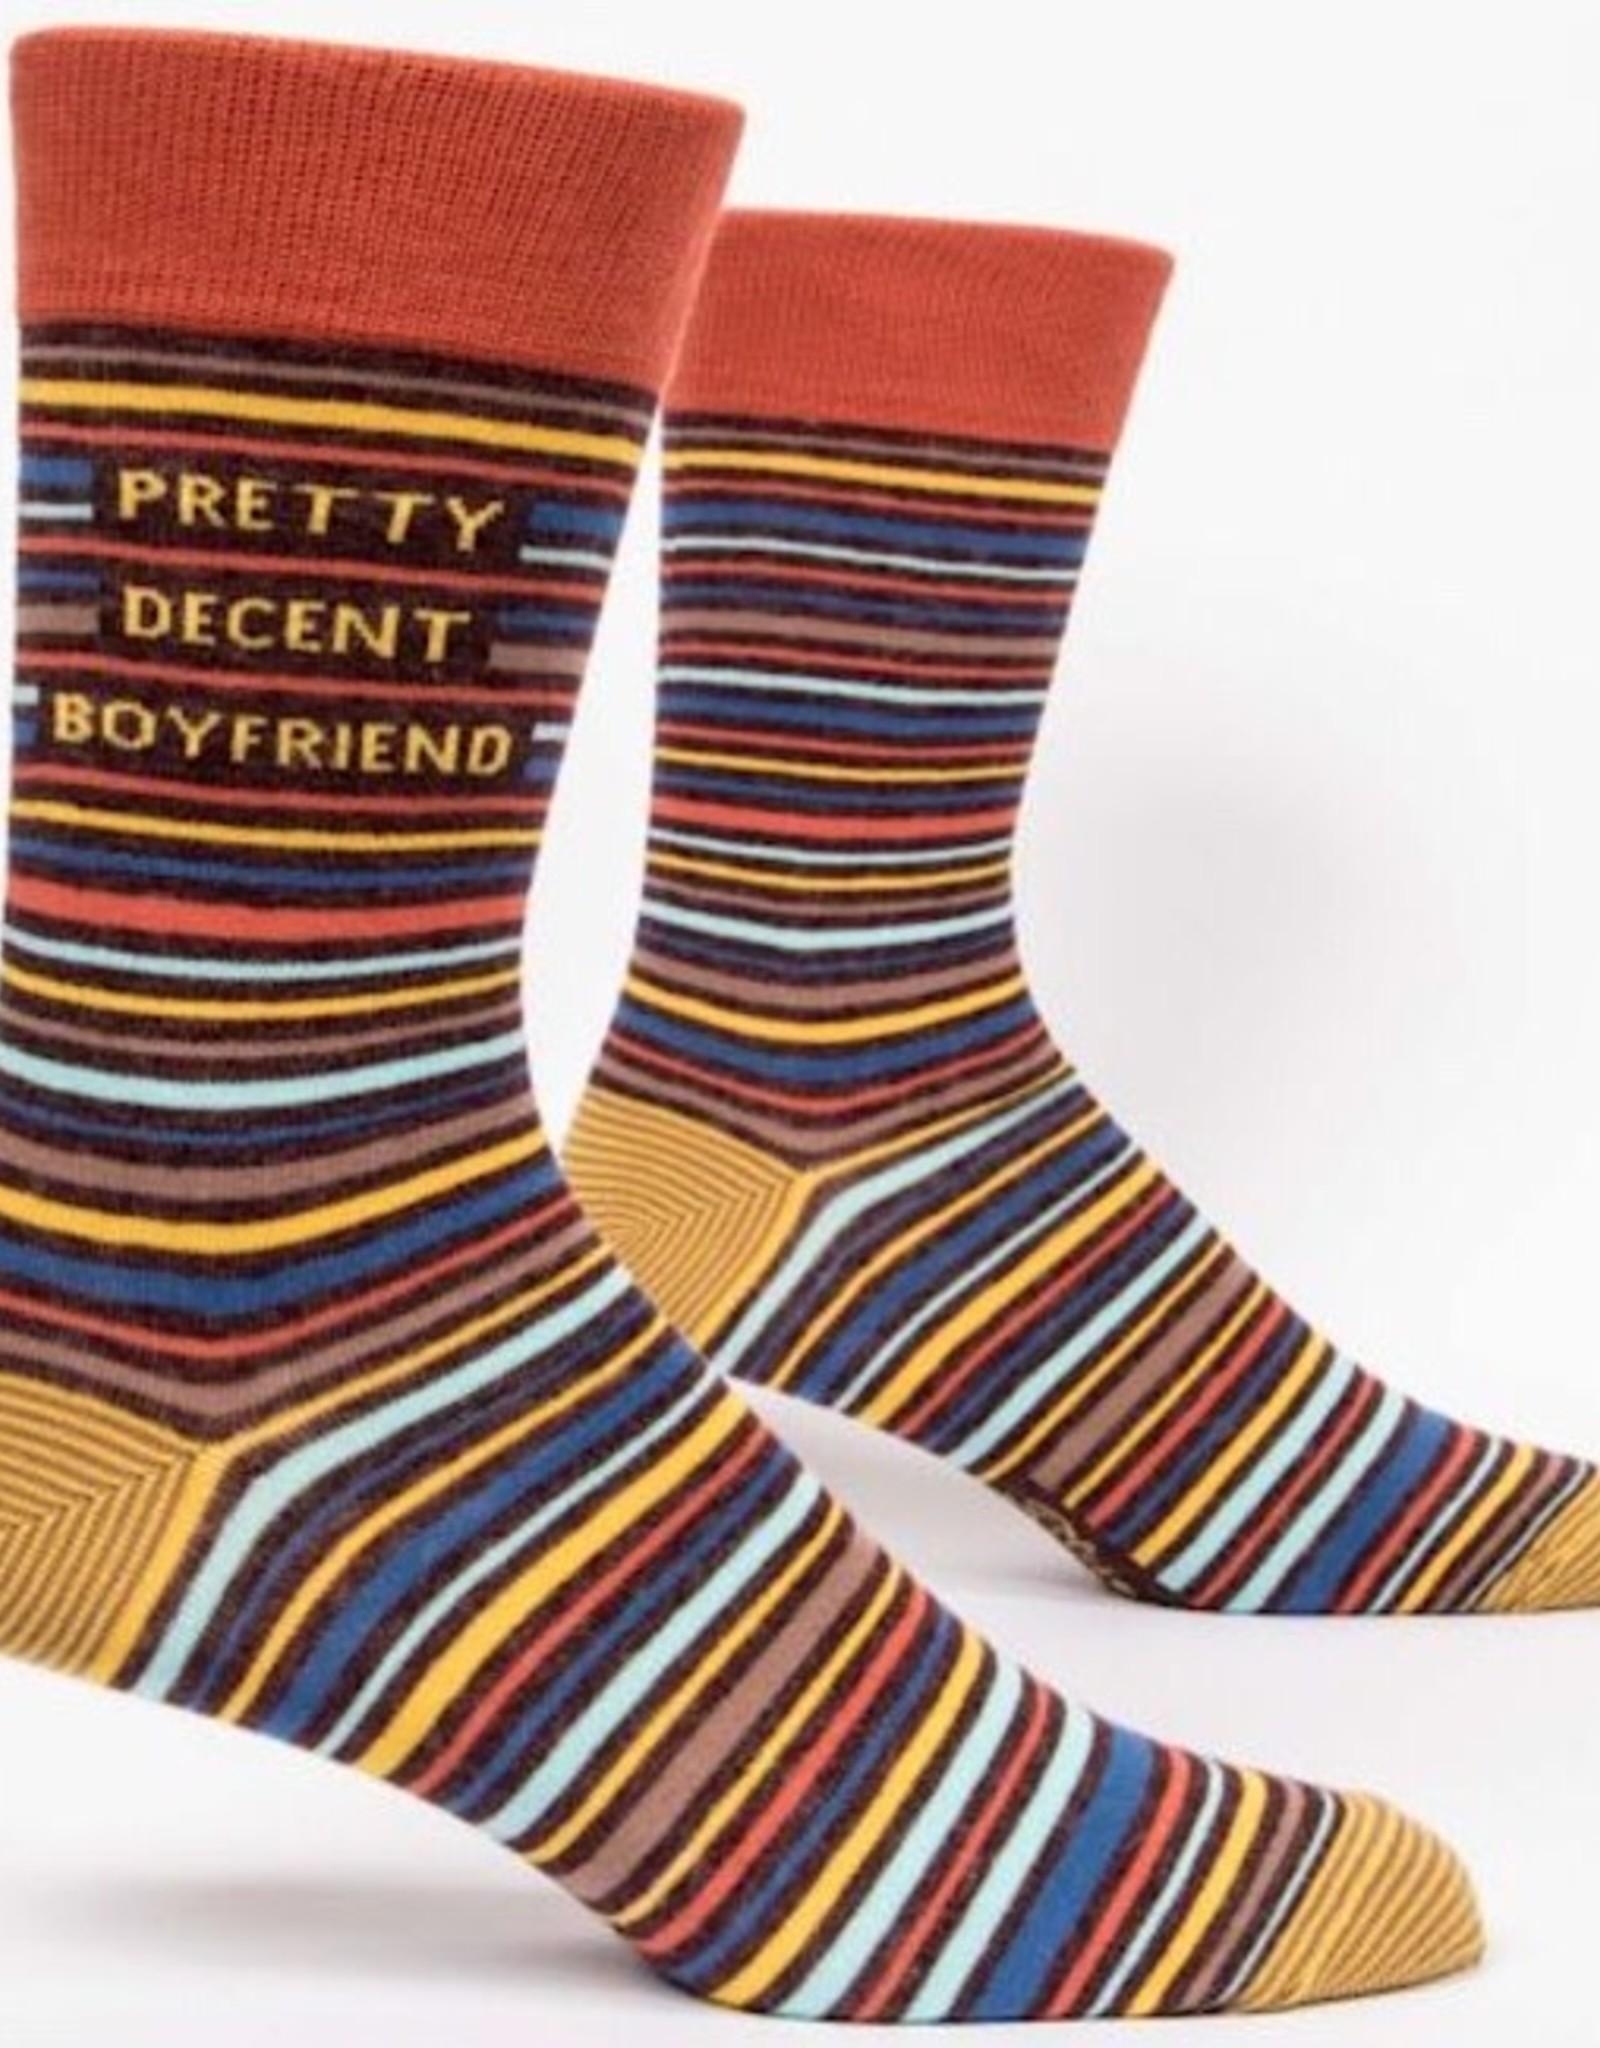 Socks (Mens)  - Pretty Decent Boyfriend